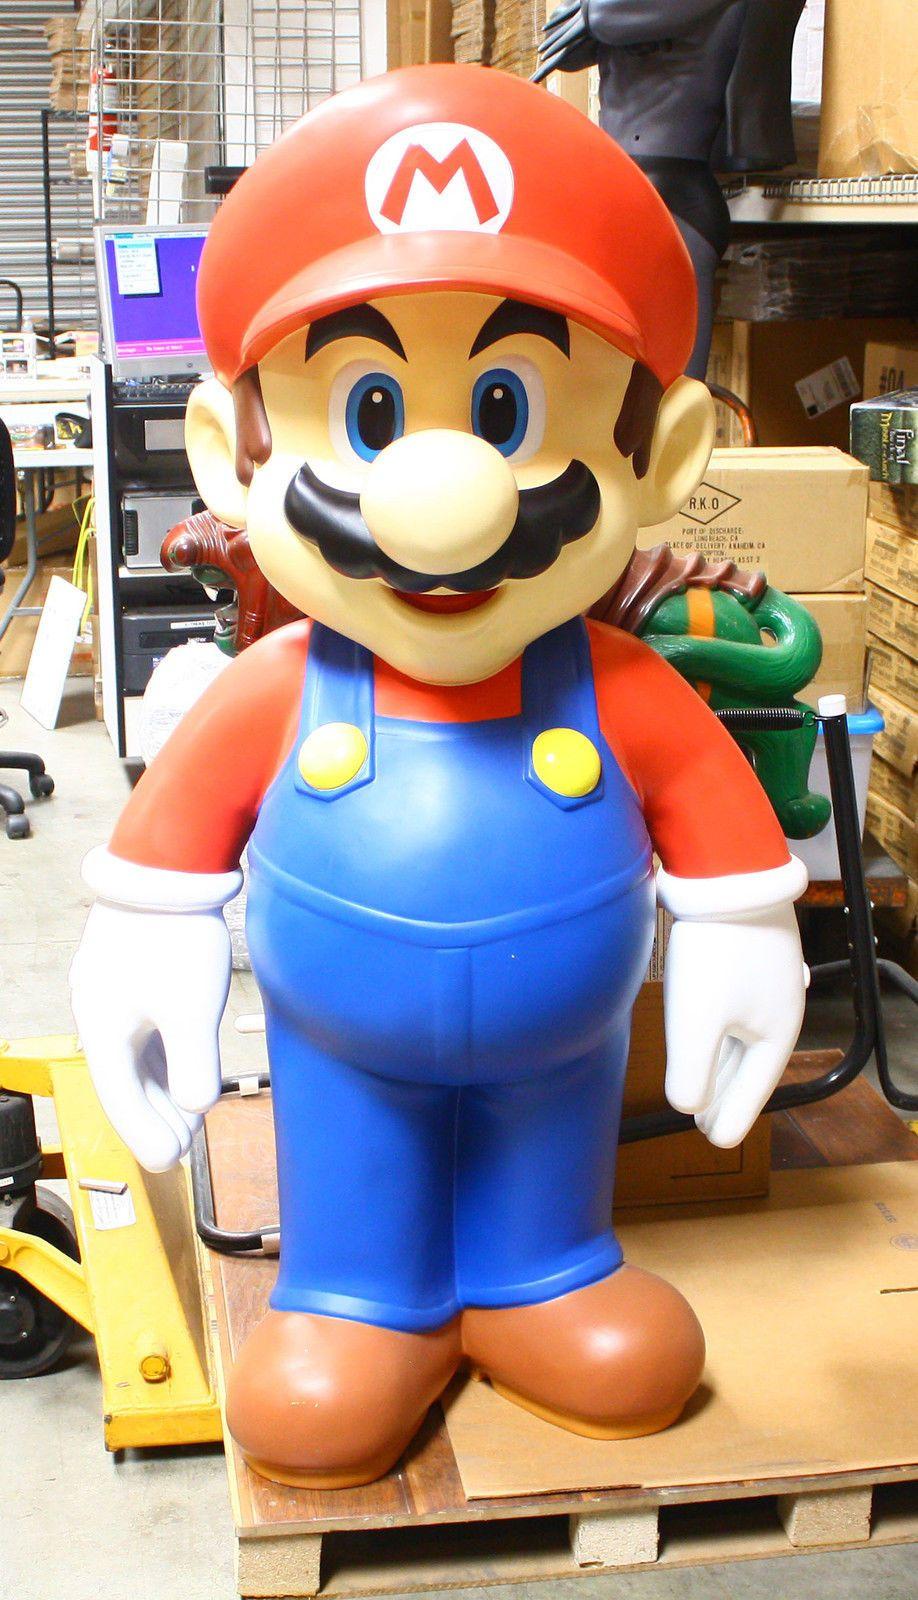 Super Mario Brother MARIO Action Figure Statue Model Figurines KO Toys Kid Gift